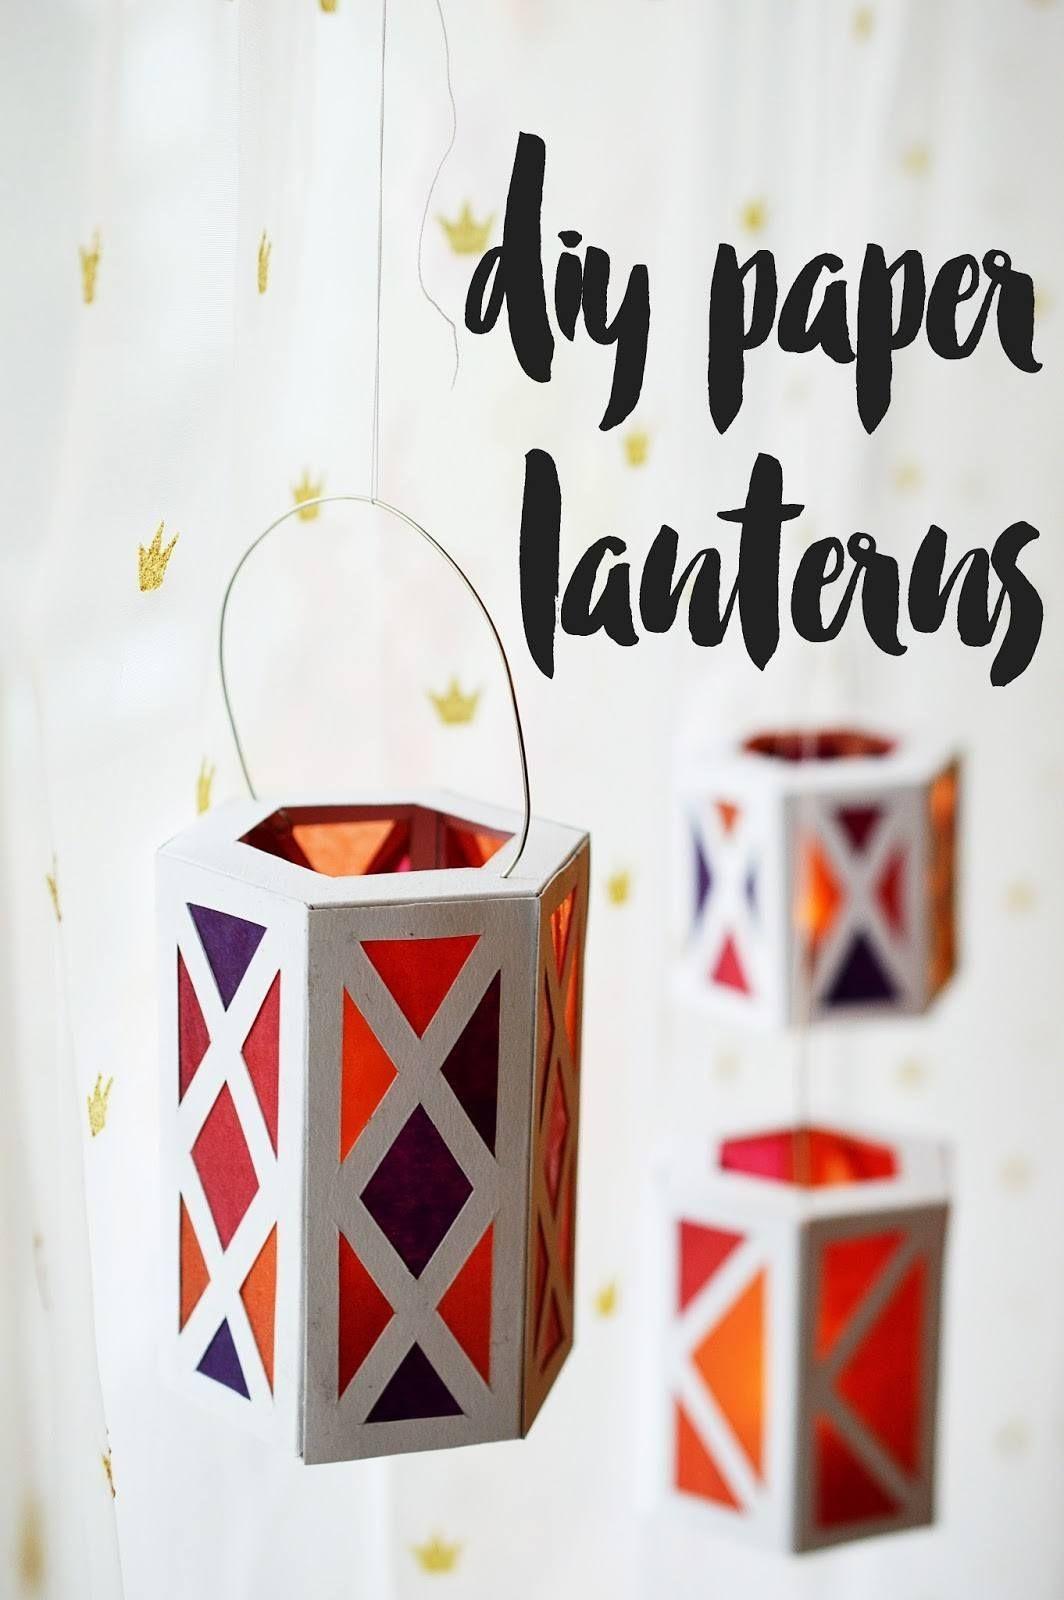 Papercraft Lantern Diy Paper Lanterns Homedecor … Paper Craft Pinterest